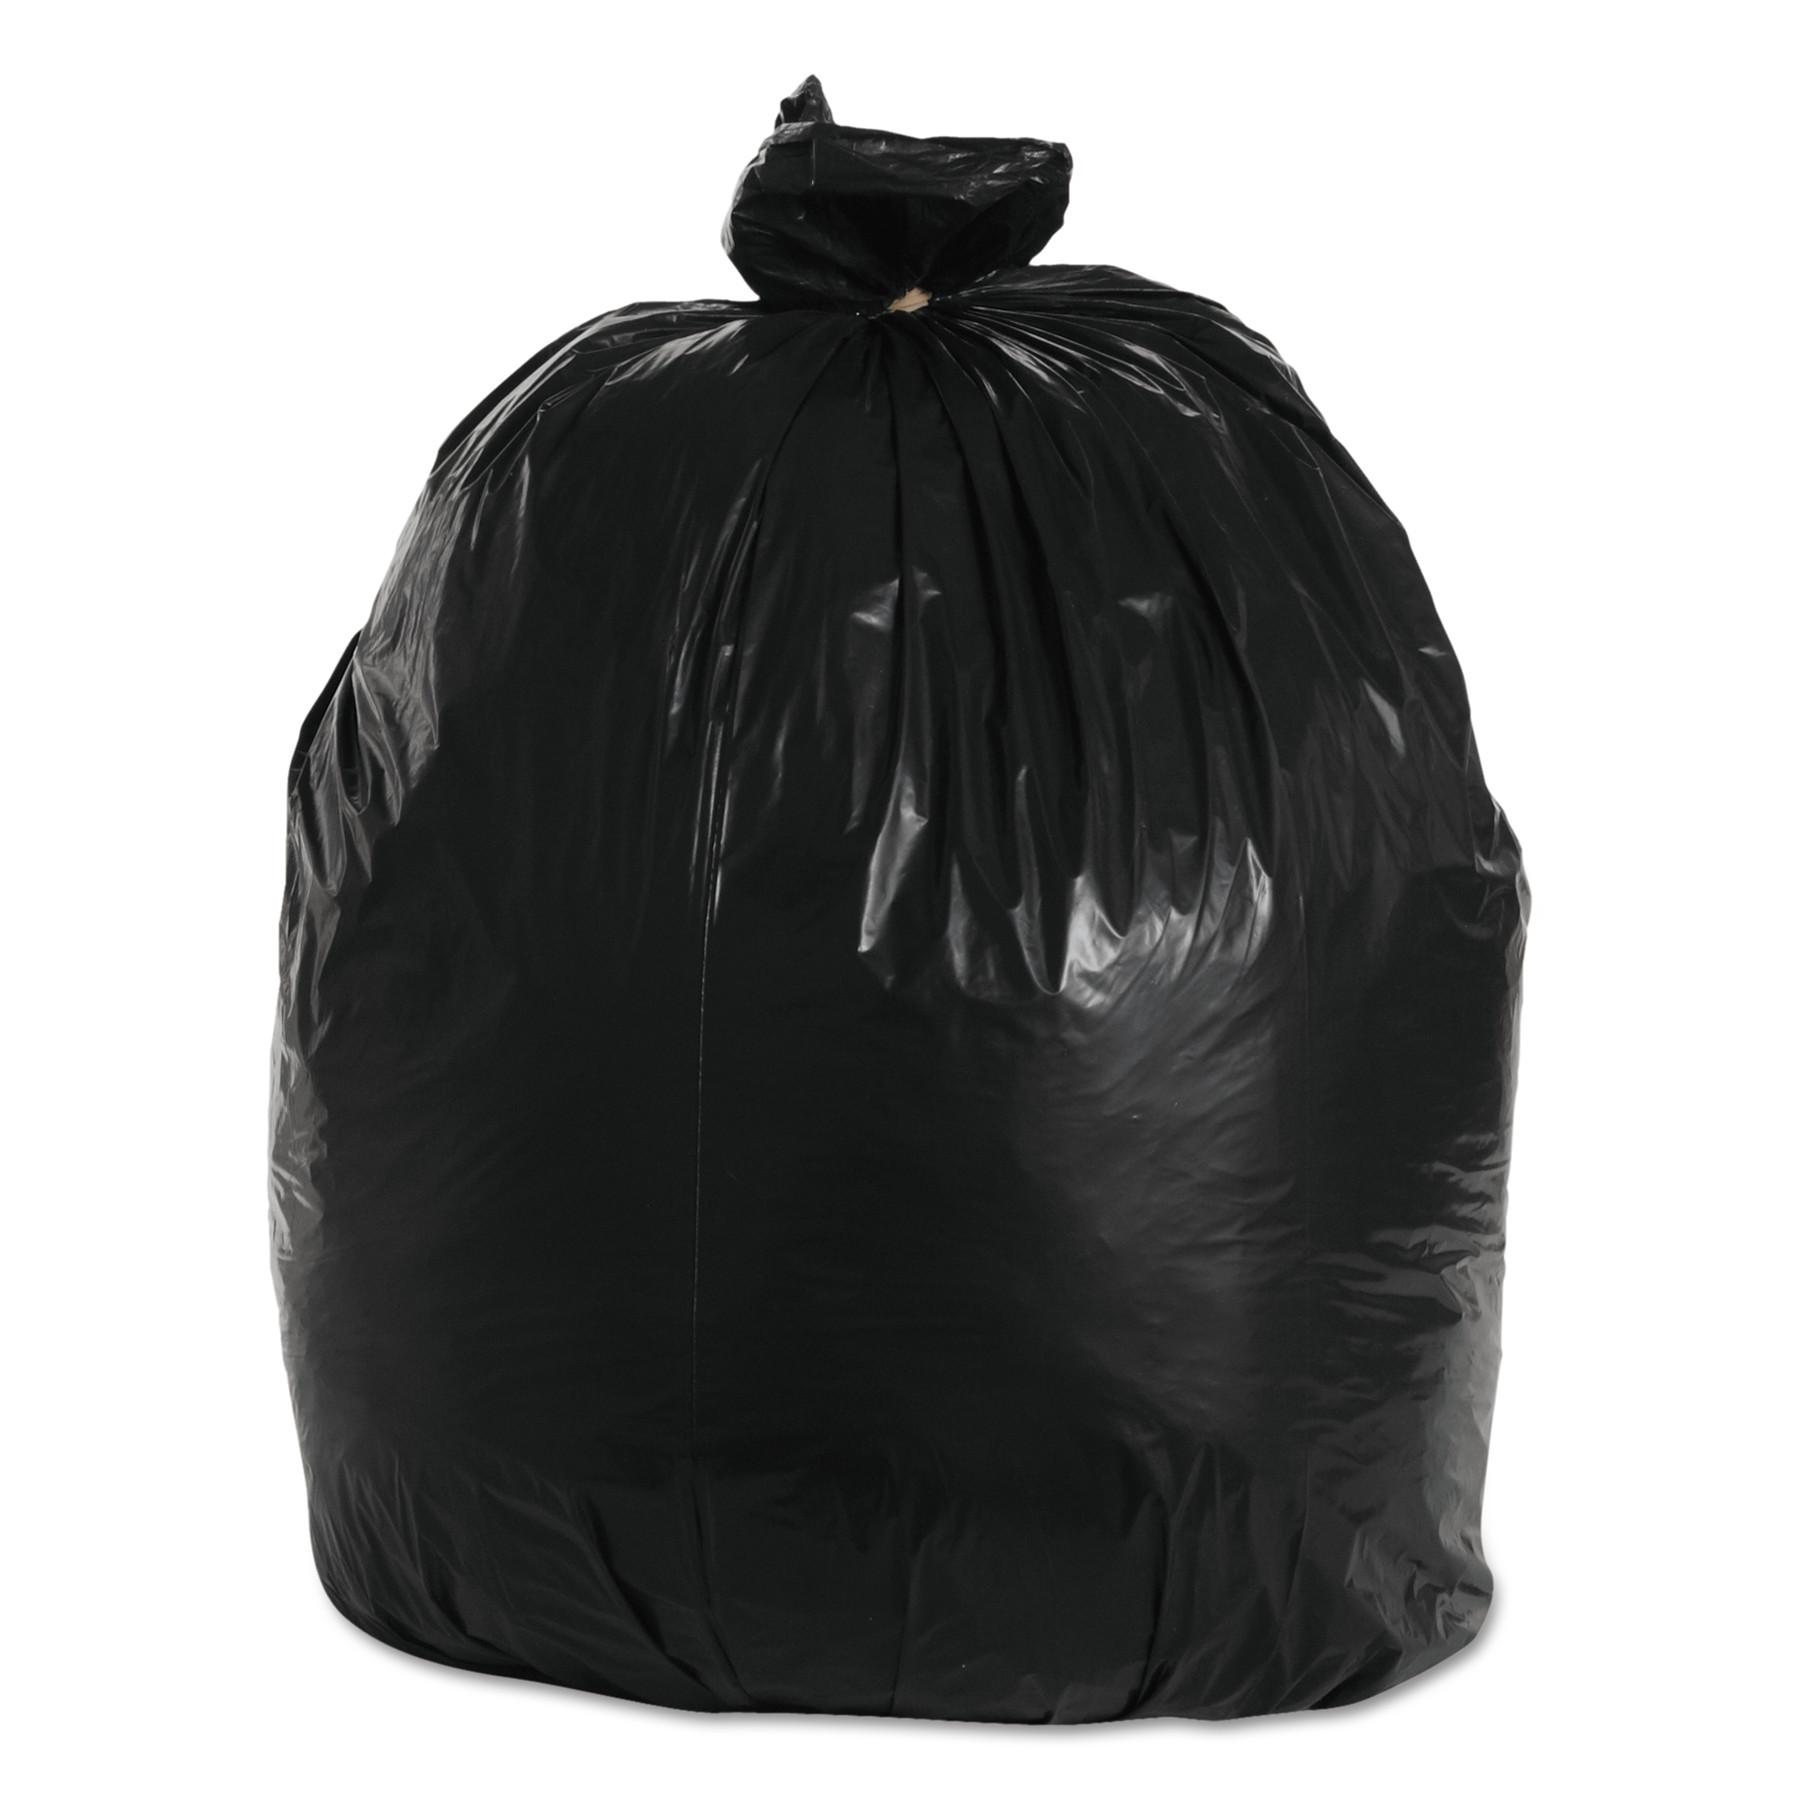 Boardwalk Super-Heavy Grade Trash Bag, 33x39, 1.2 Mil, 33 Gal, Blk, 10 Bag/RL, 10 Rolls/CT